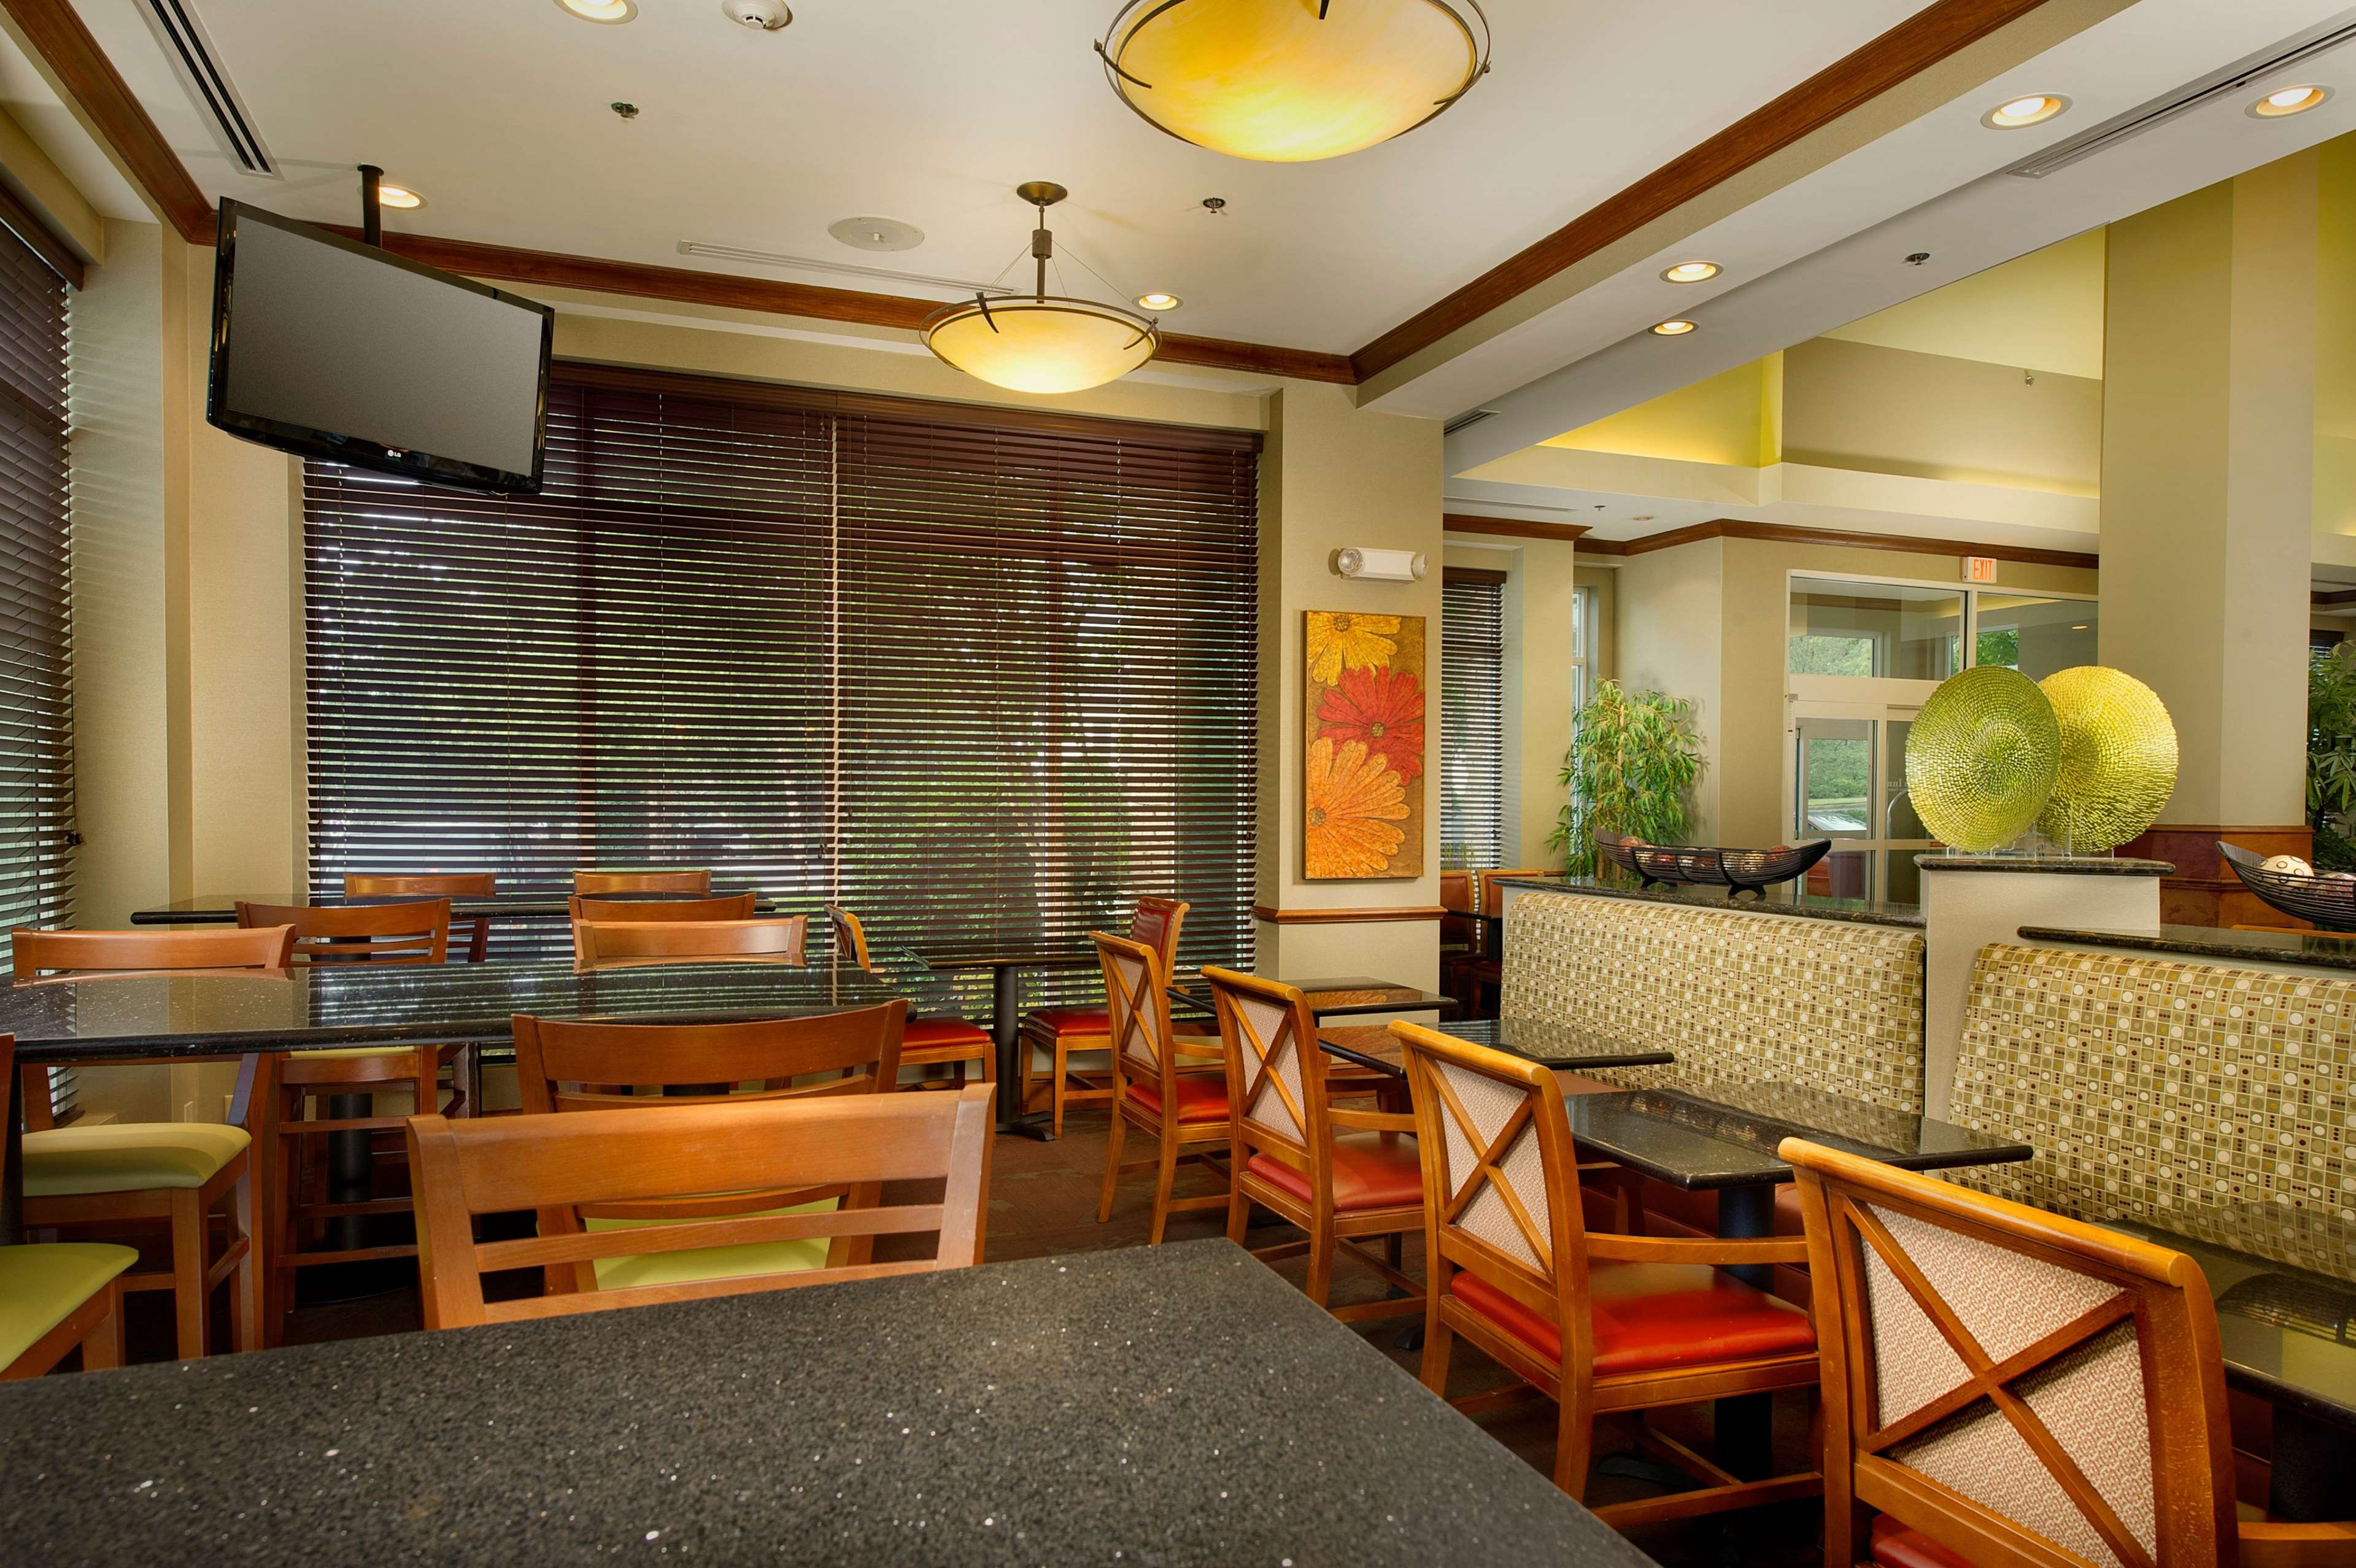 Hilton Garden Inn Atlanta NW/Kennesaw Town Center image 4